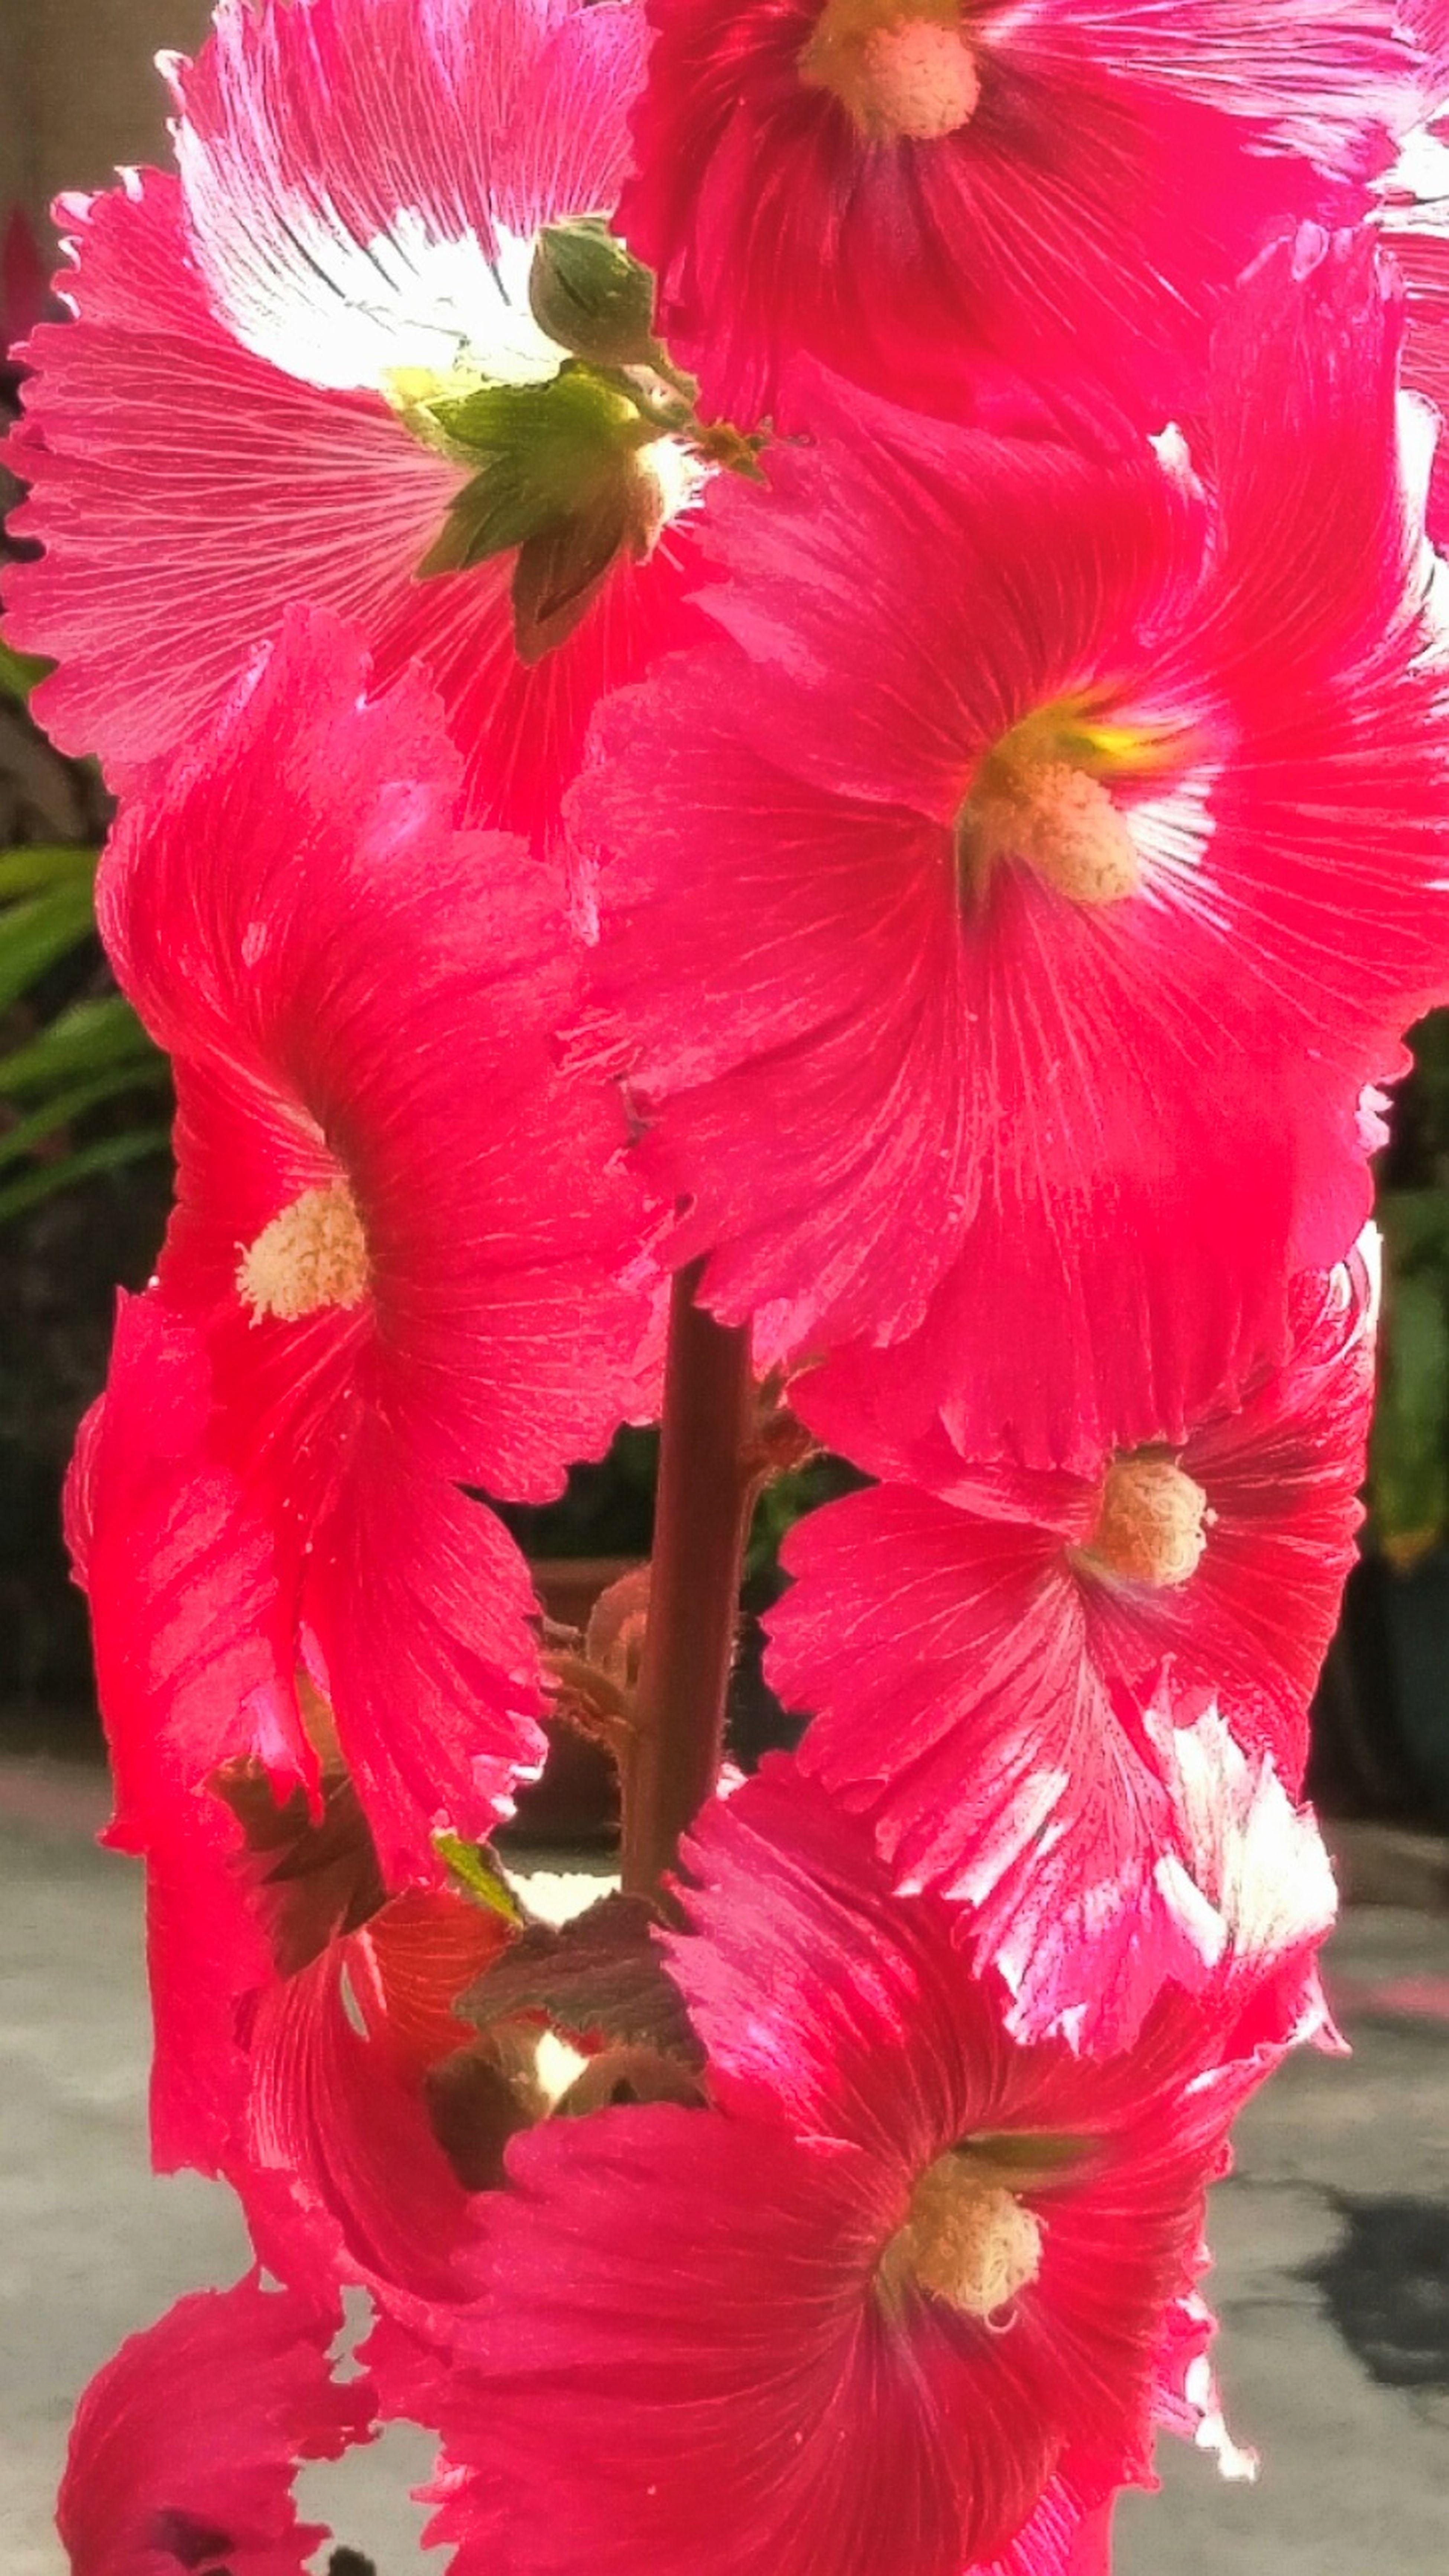 Flower 蜀葵花盛開的季節